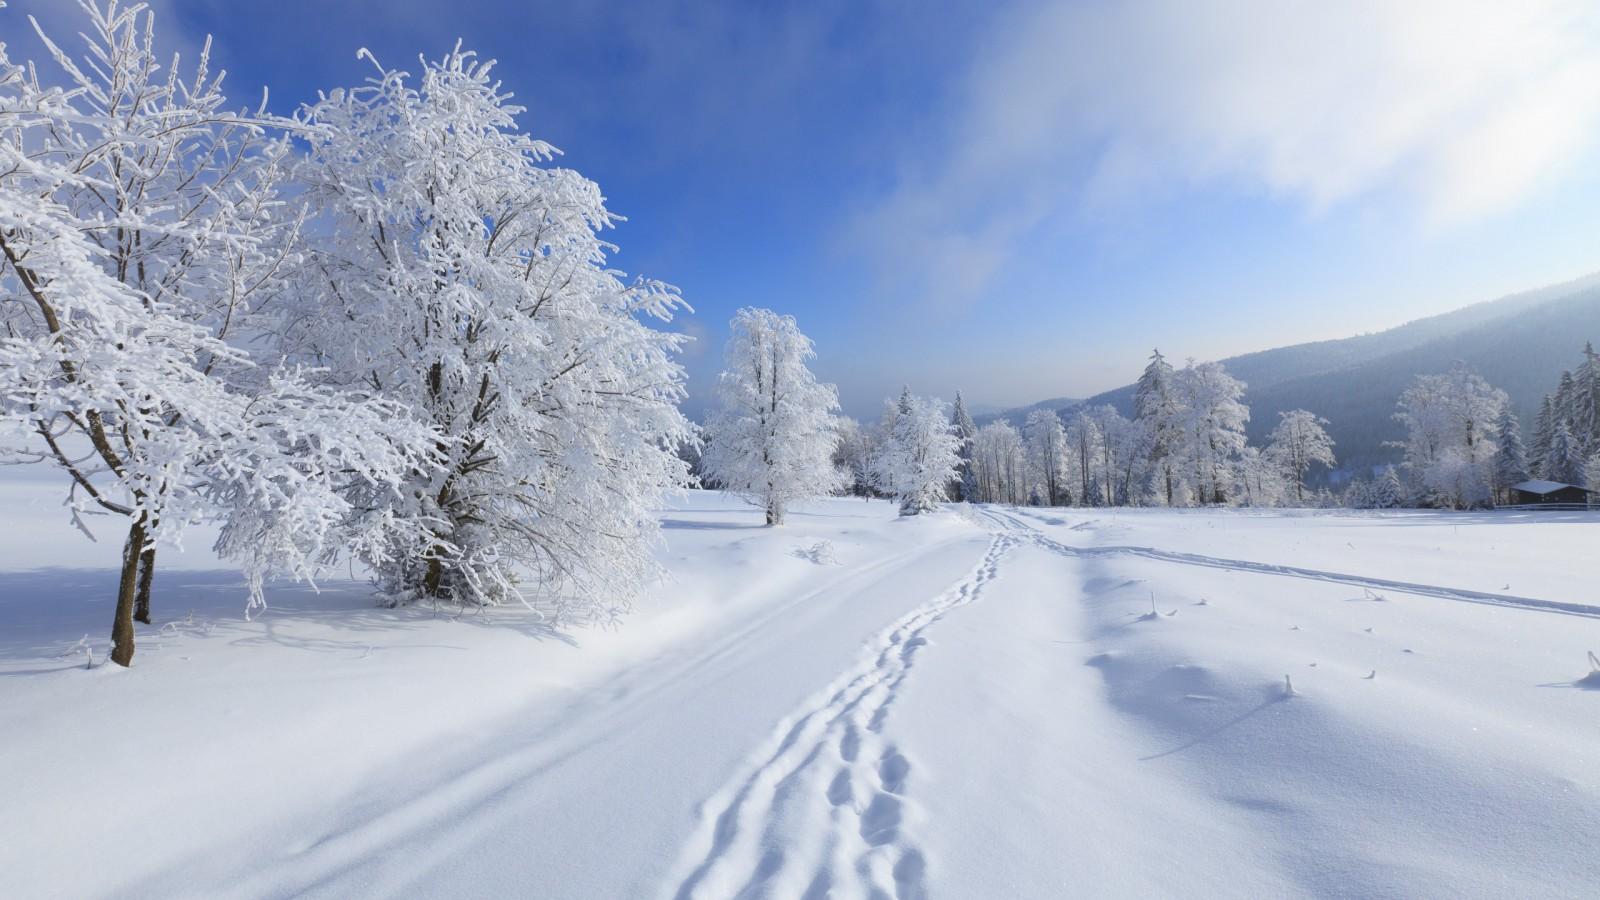 Snow Egypt Wallpaper Free Download